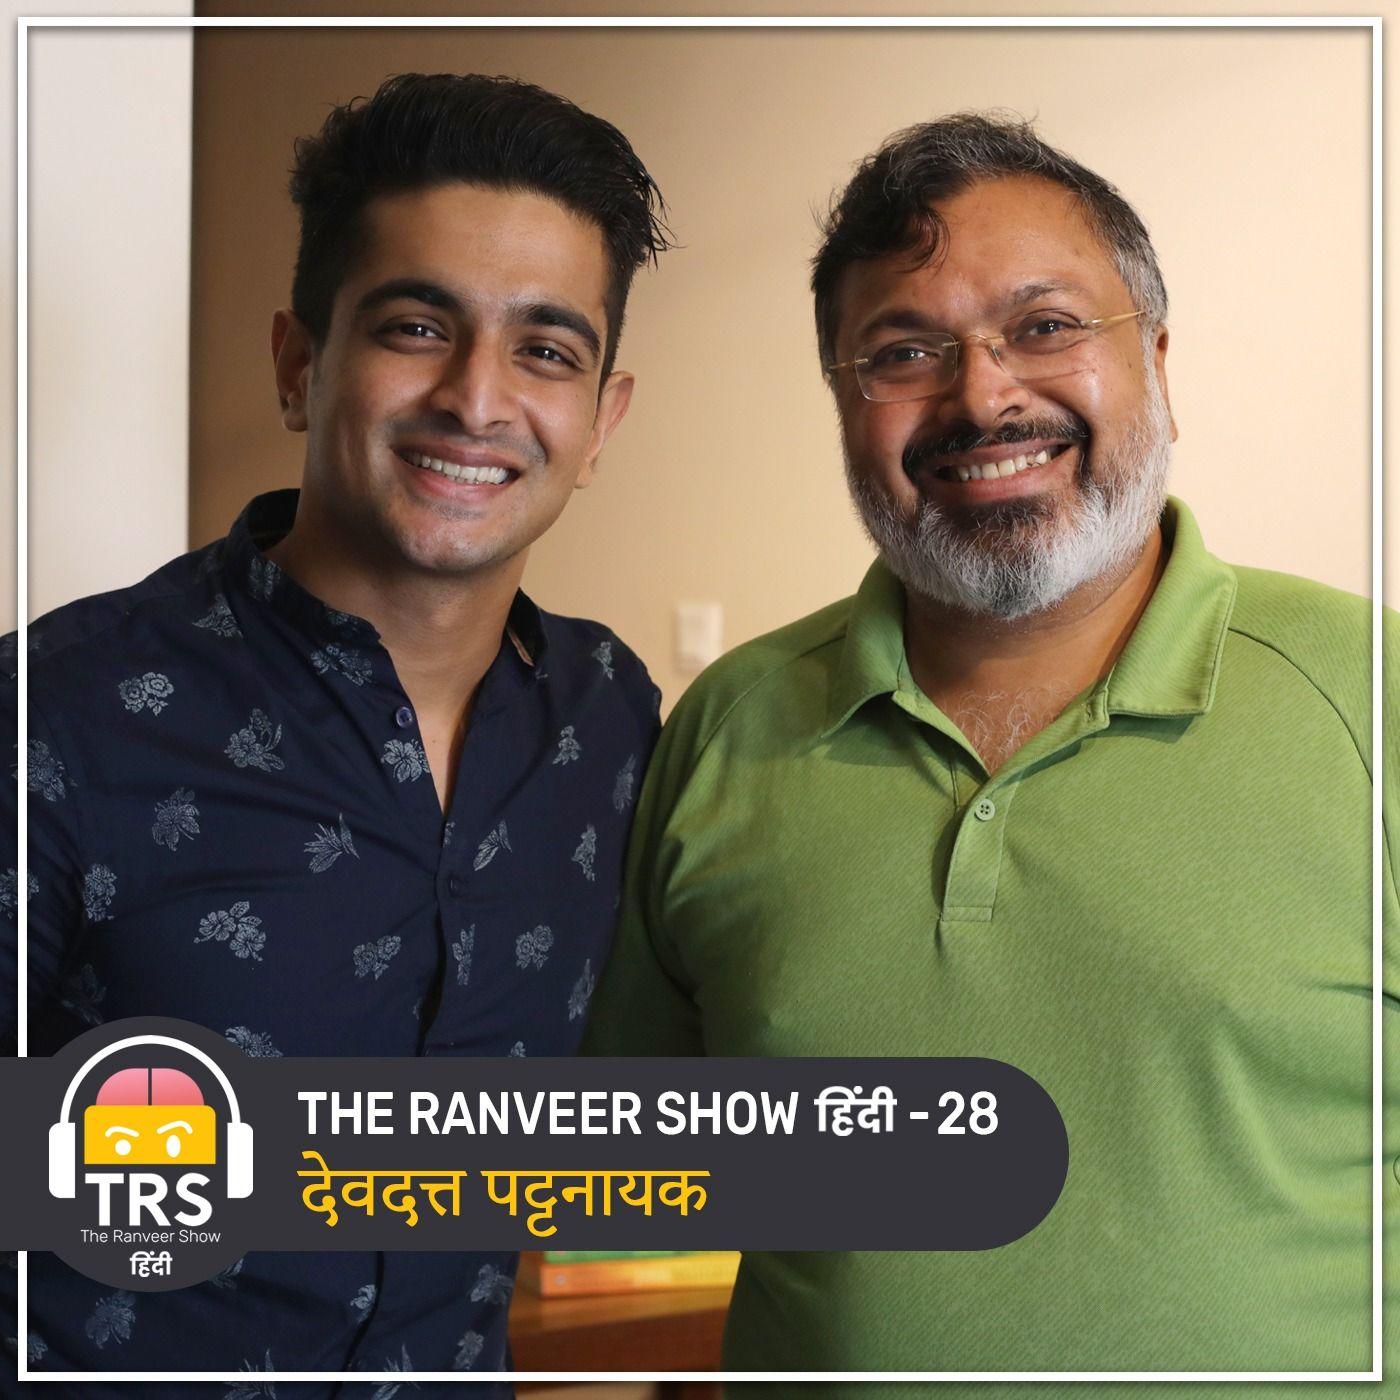 Hindu Mythology, Gods, Energies And History With Devdutt Pattanaik | The Ranveer Show हिंदी 28